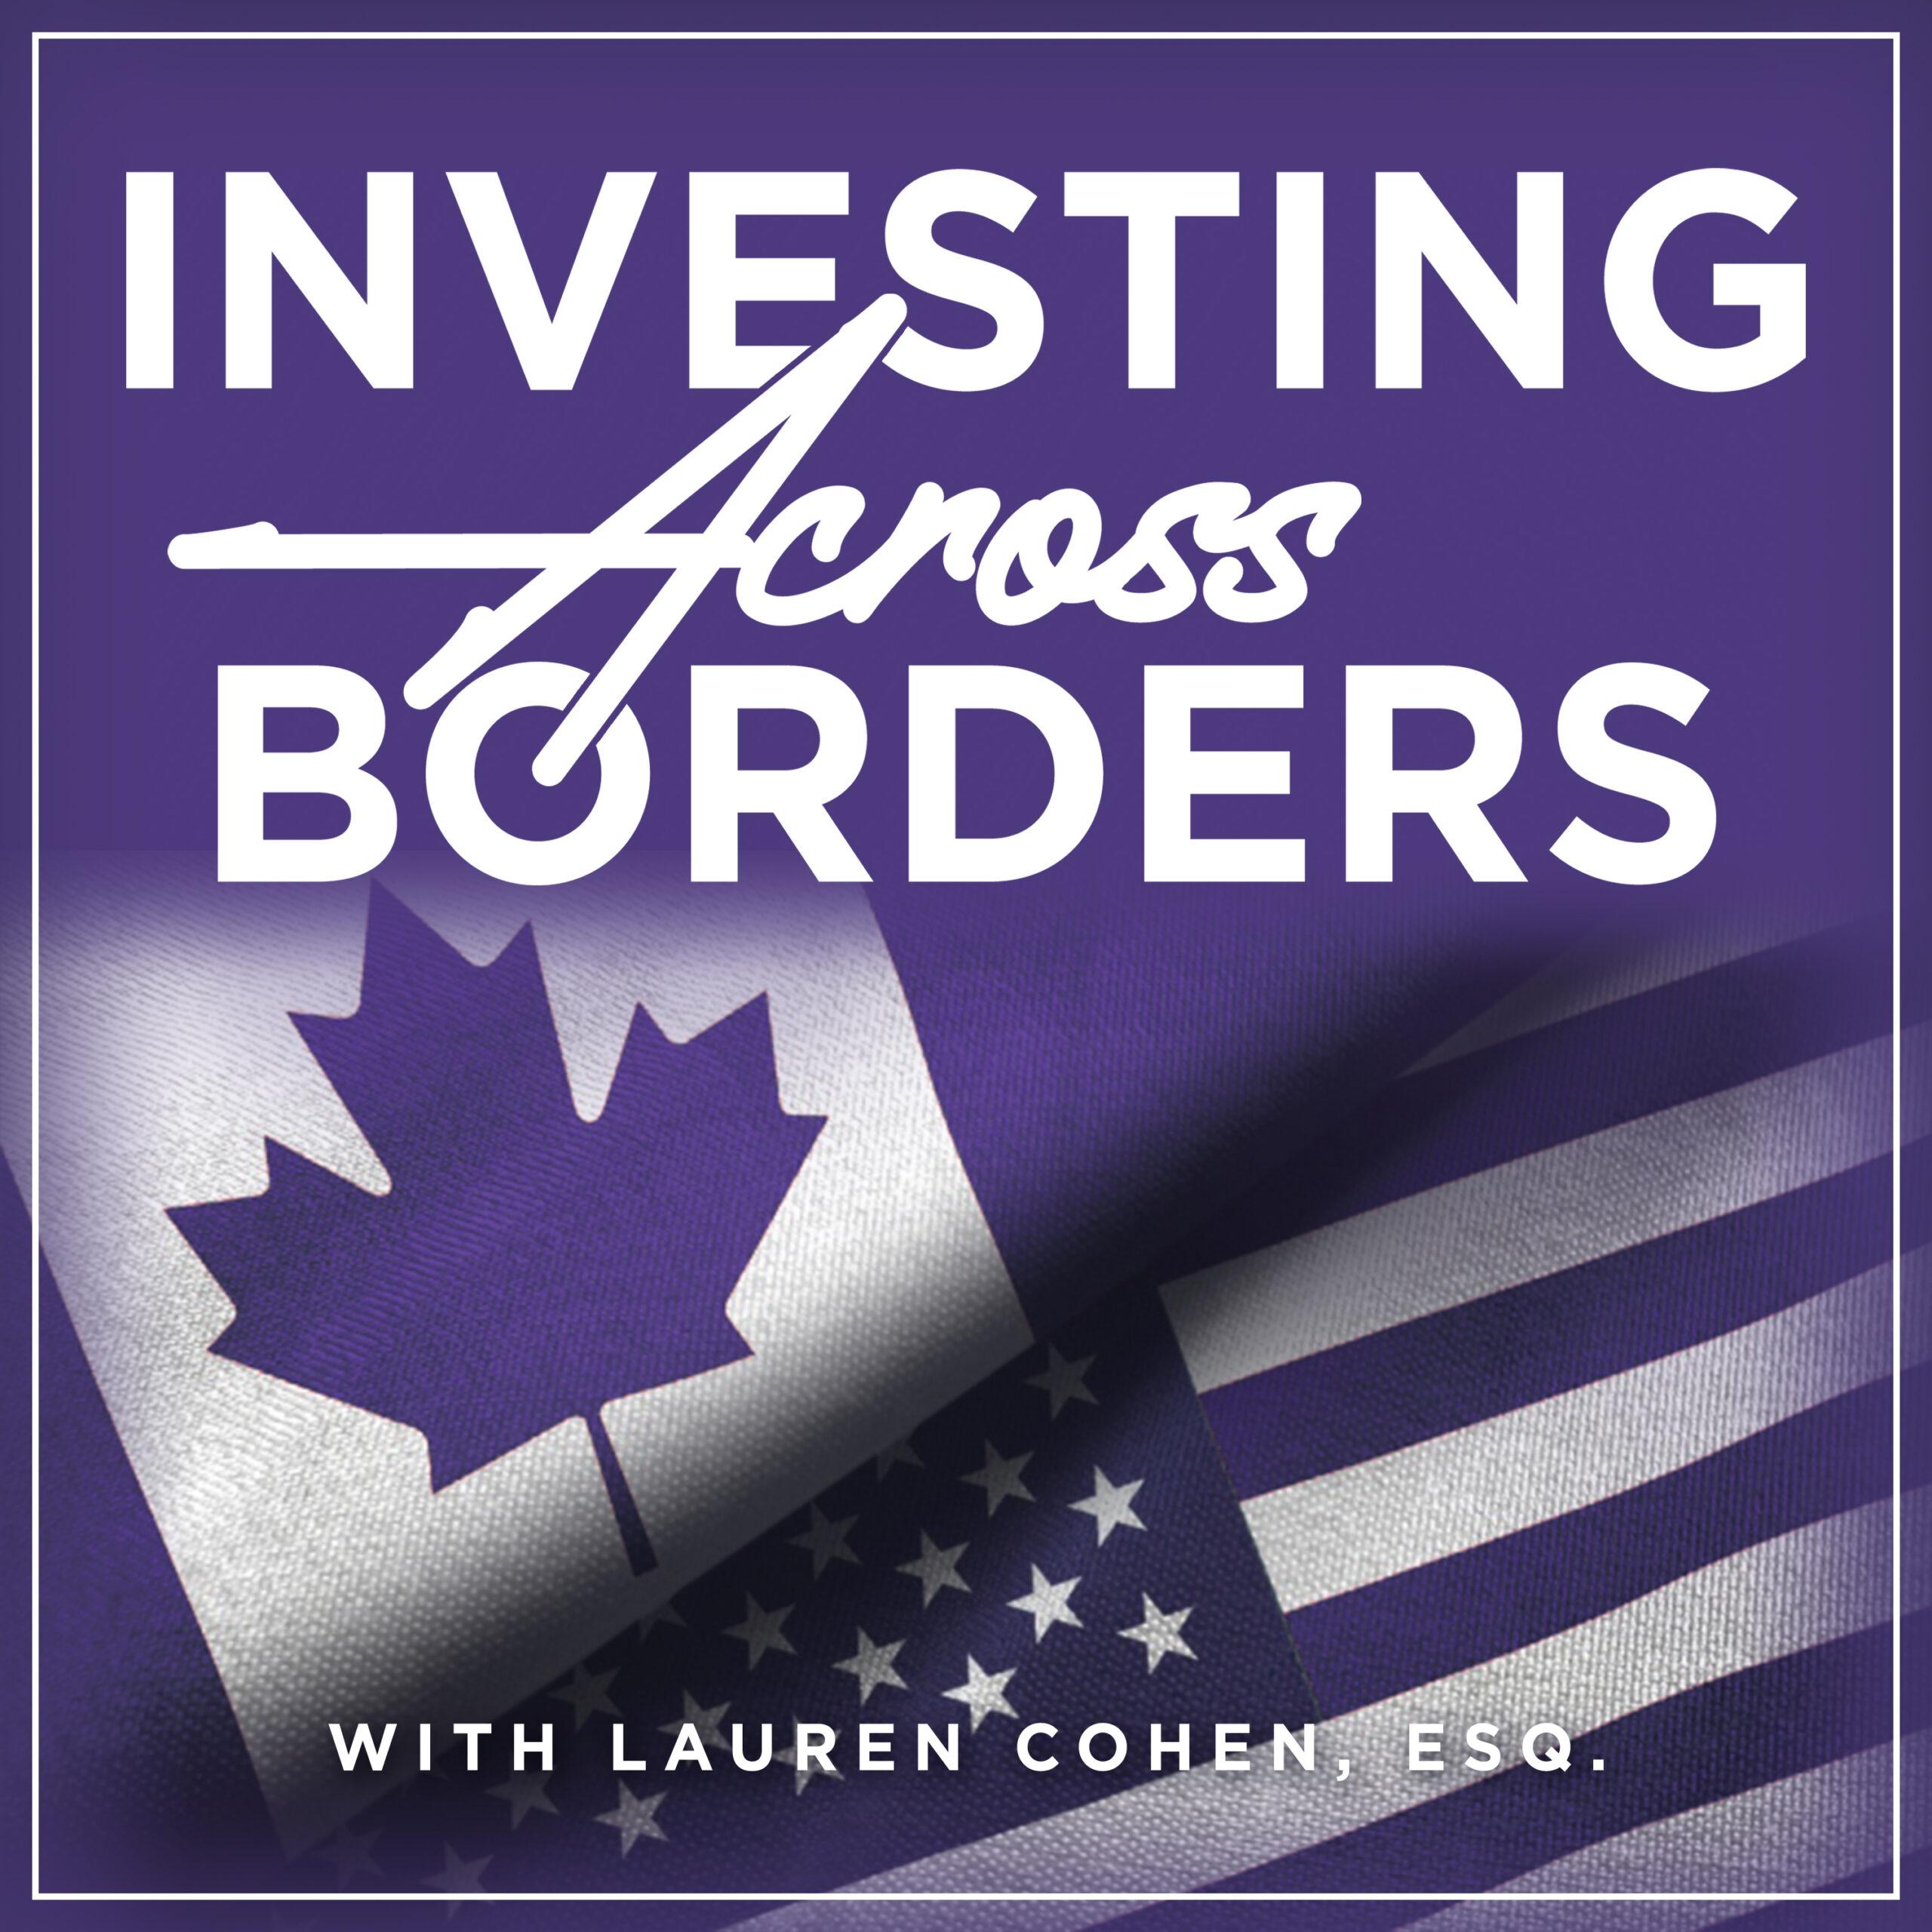 Investing Across Borders Podcast with Lauren Cohen, ESQ.